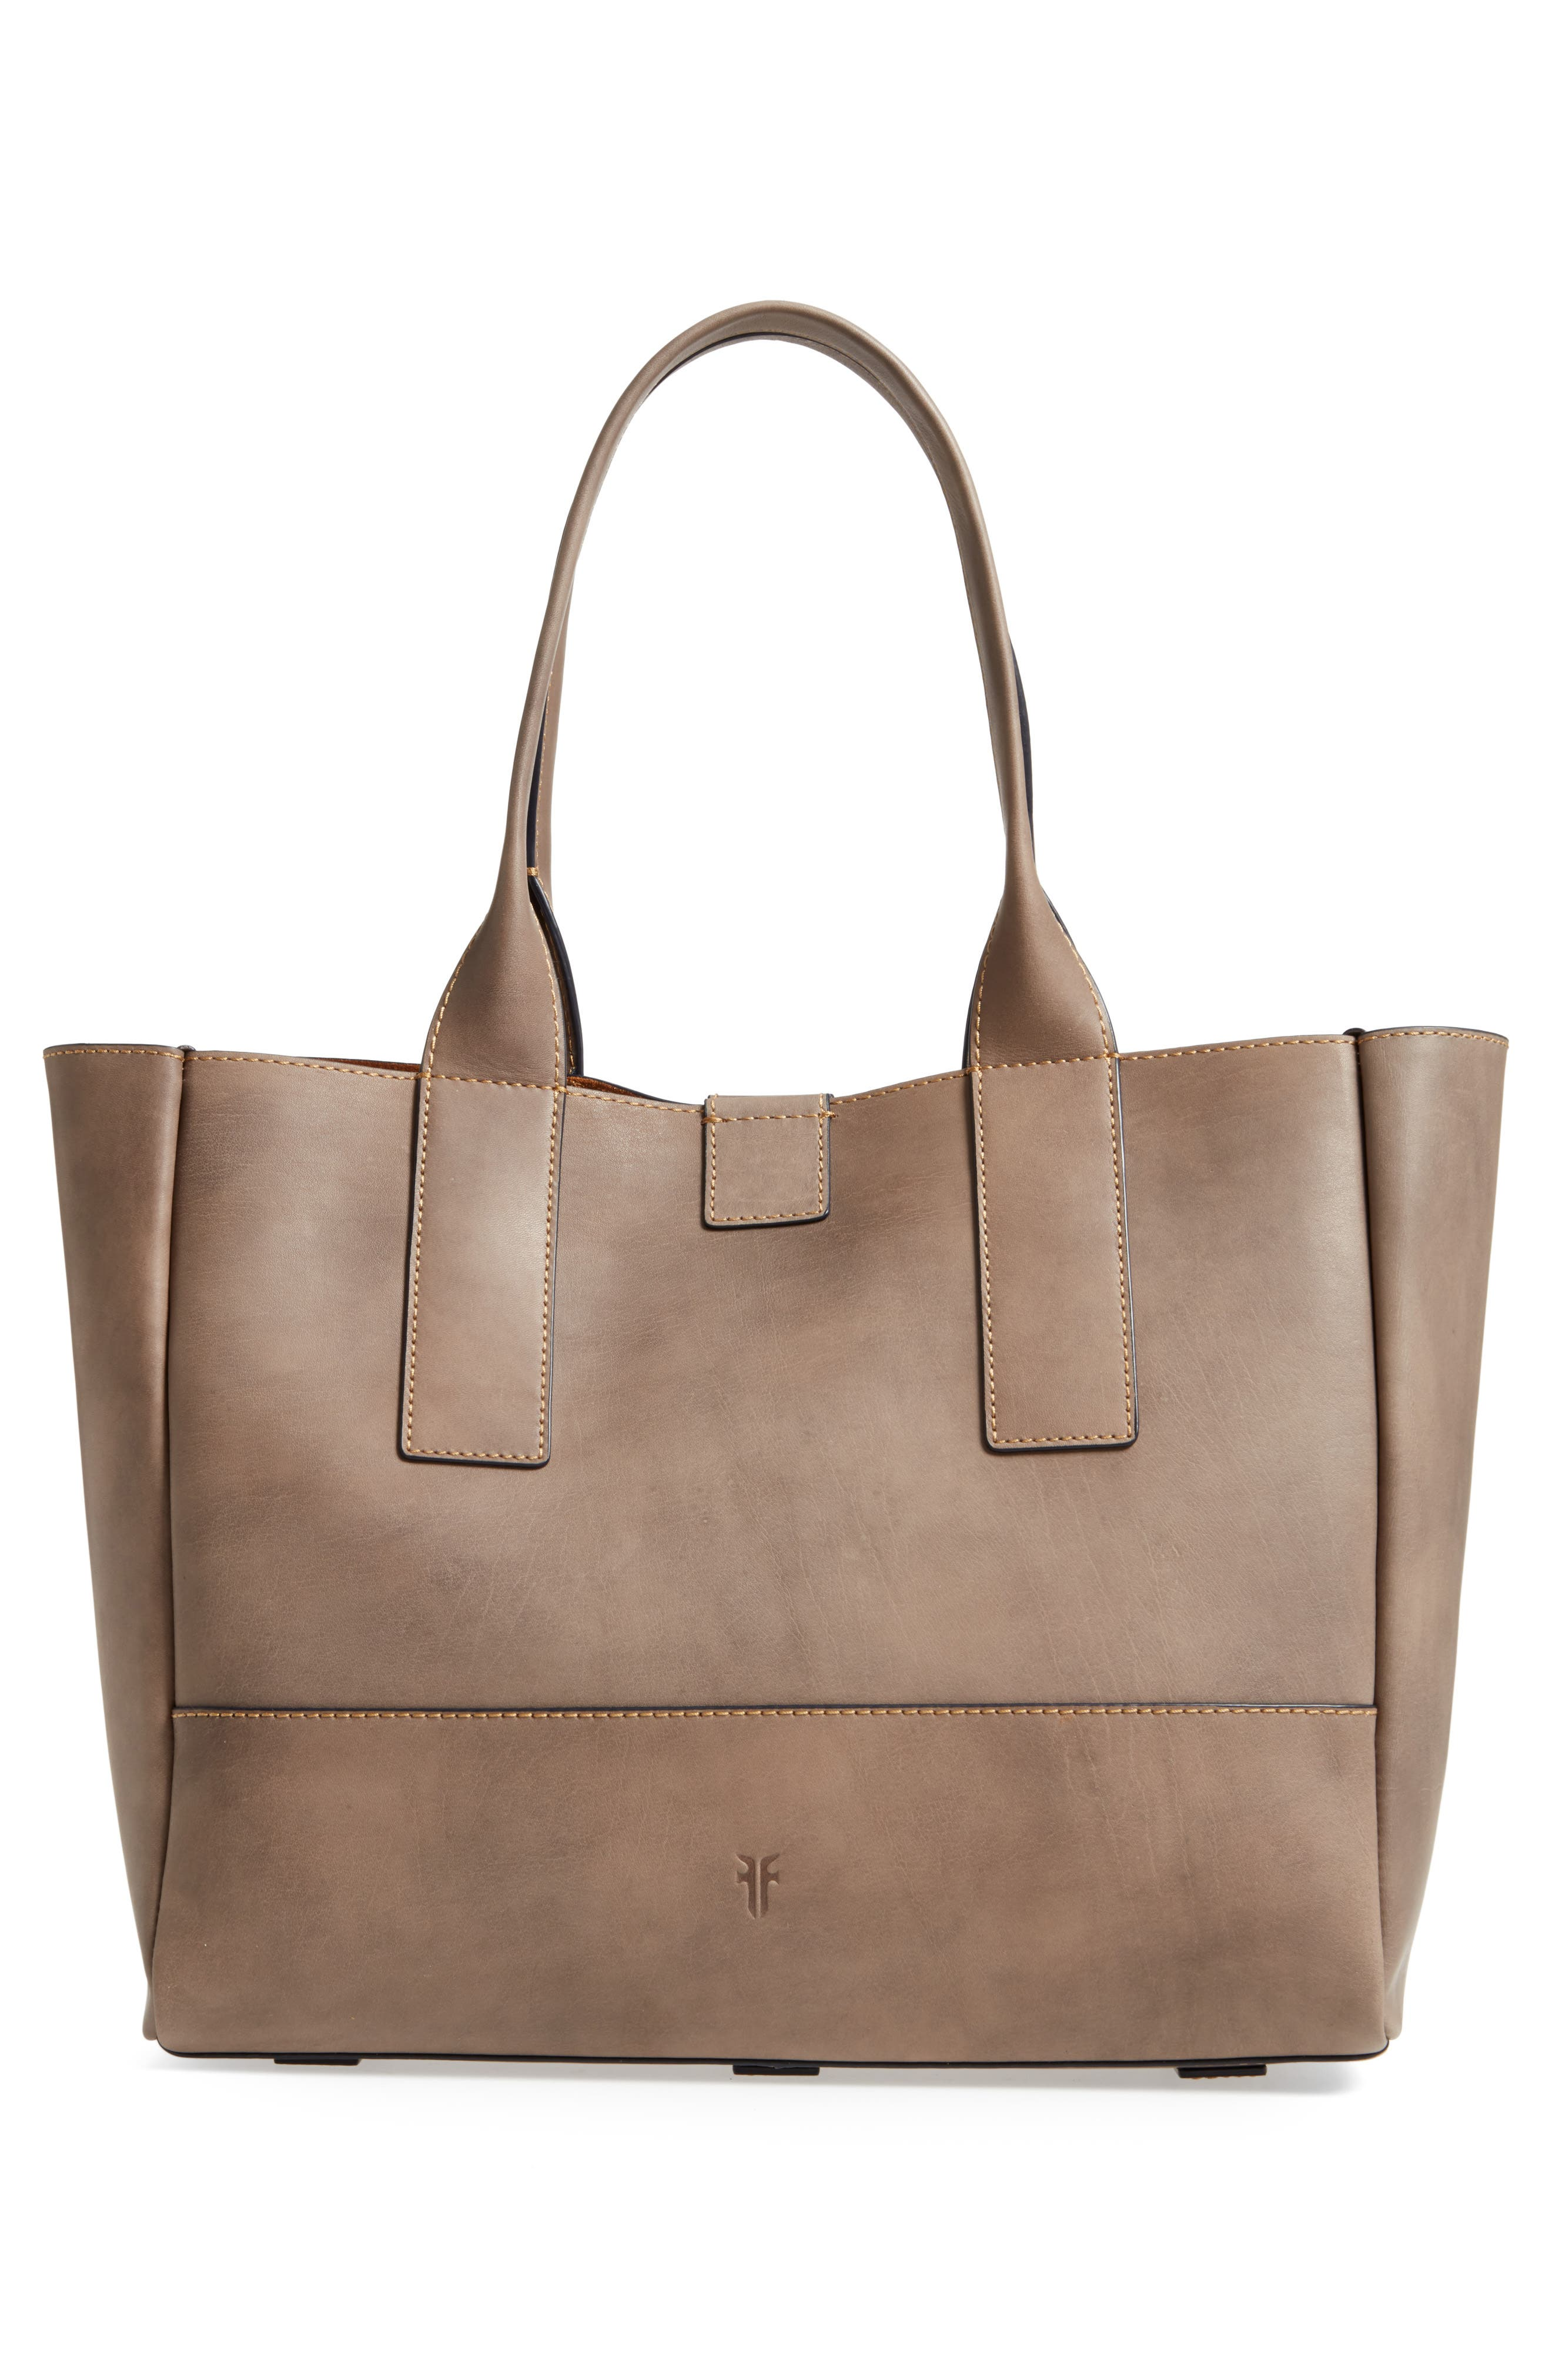 Ilana Harness Leather Shopper,                             Alternate thumbnail 3, color,                             030